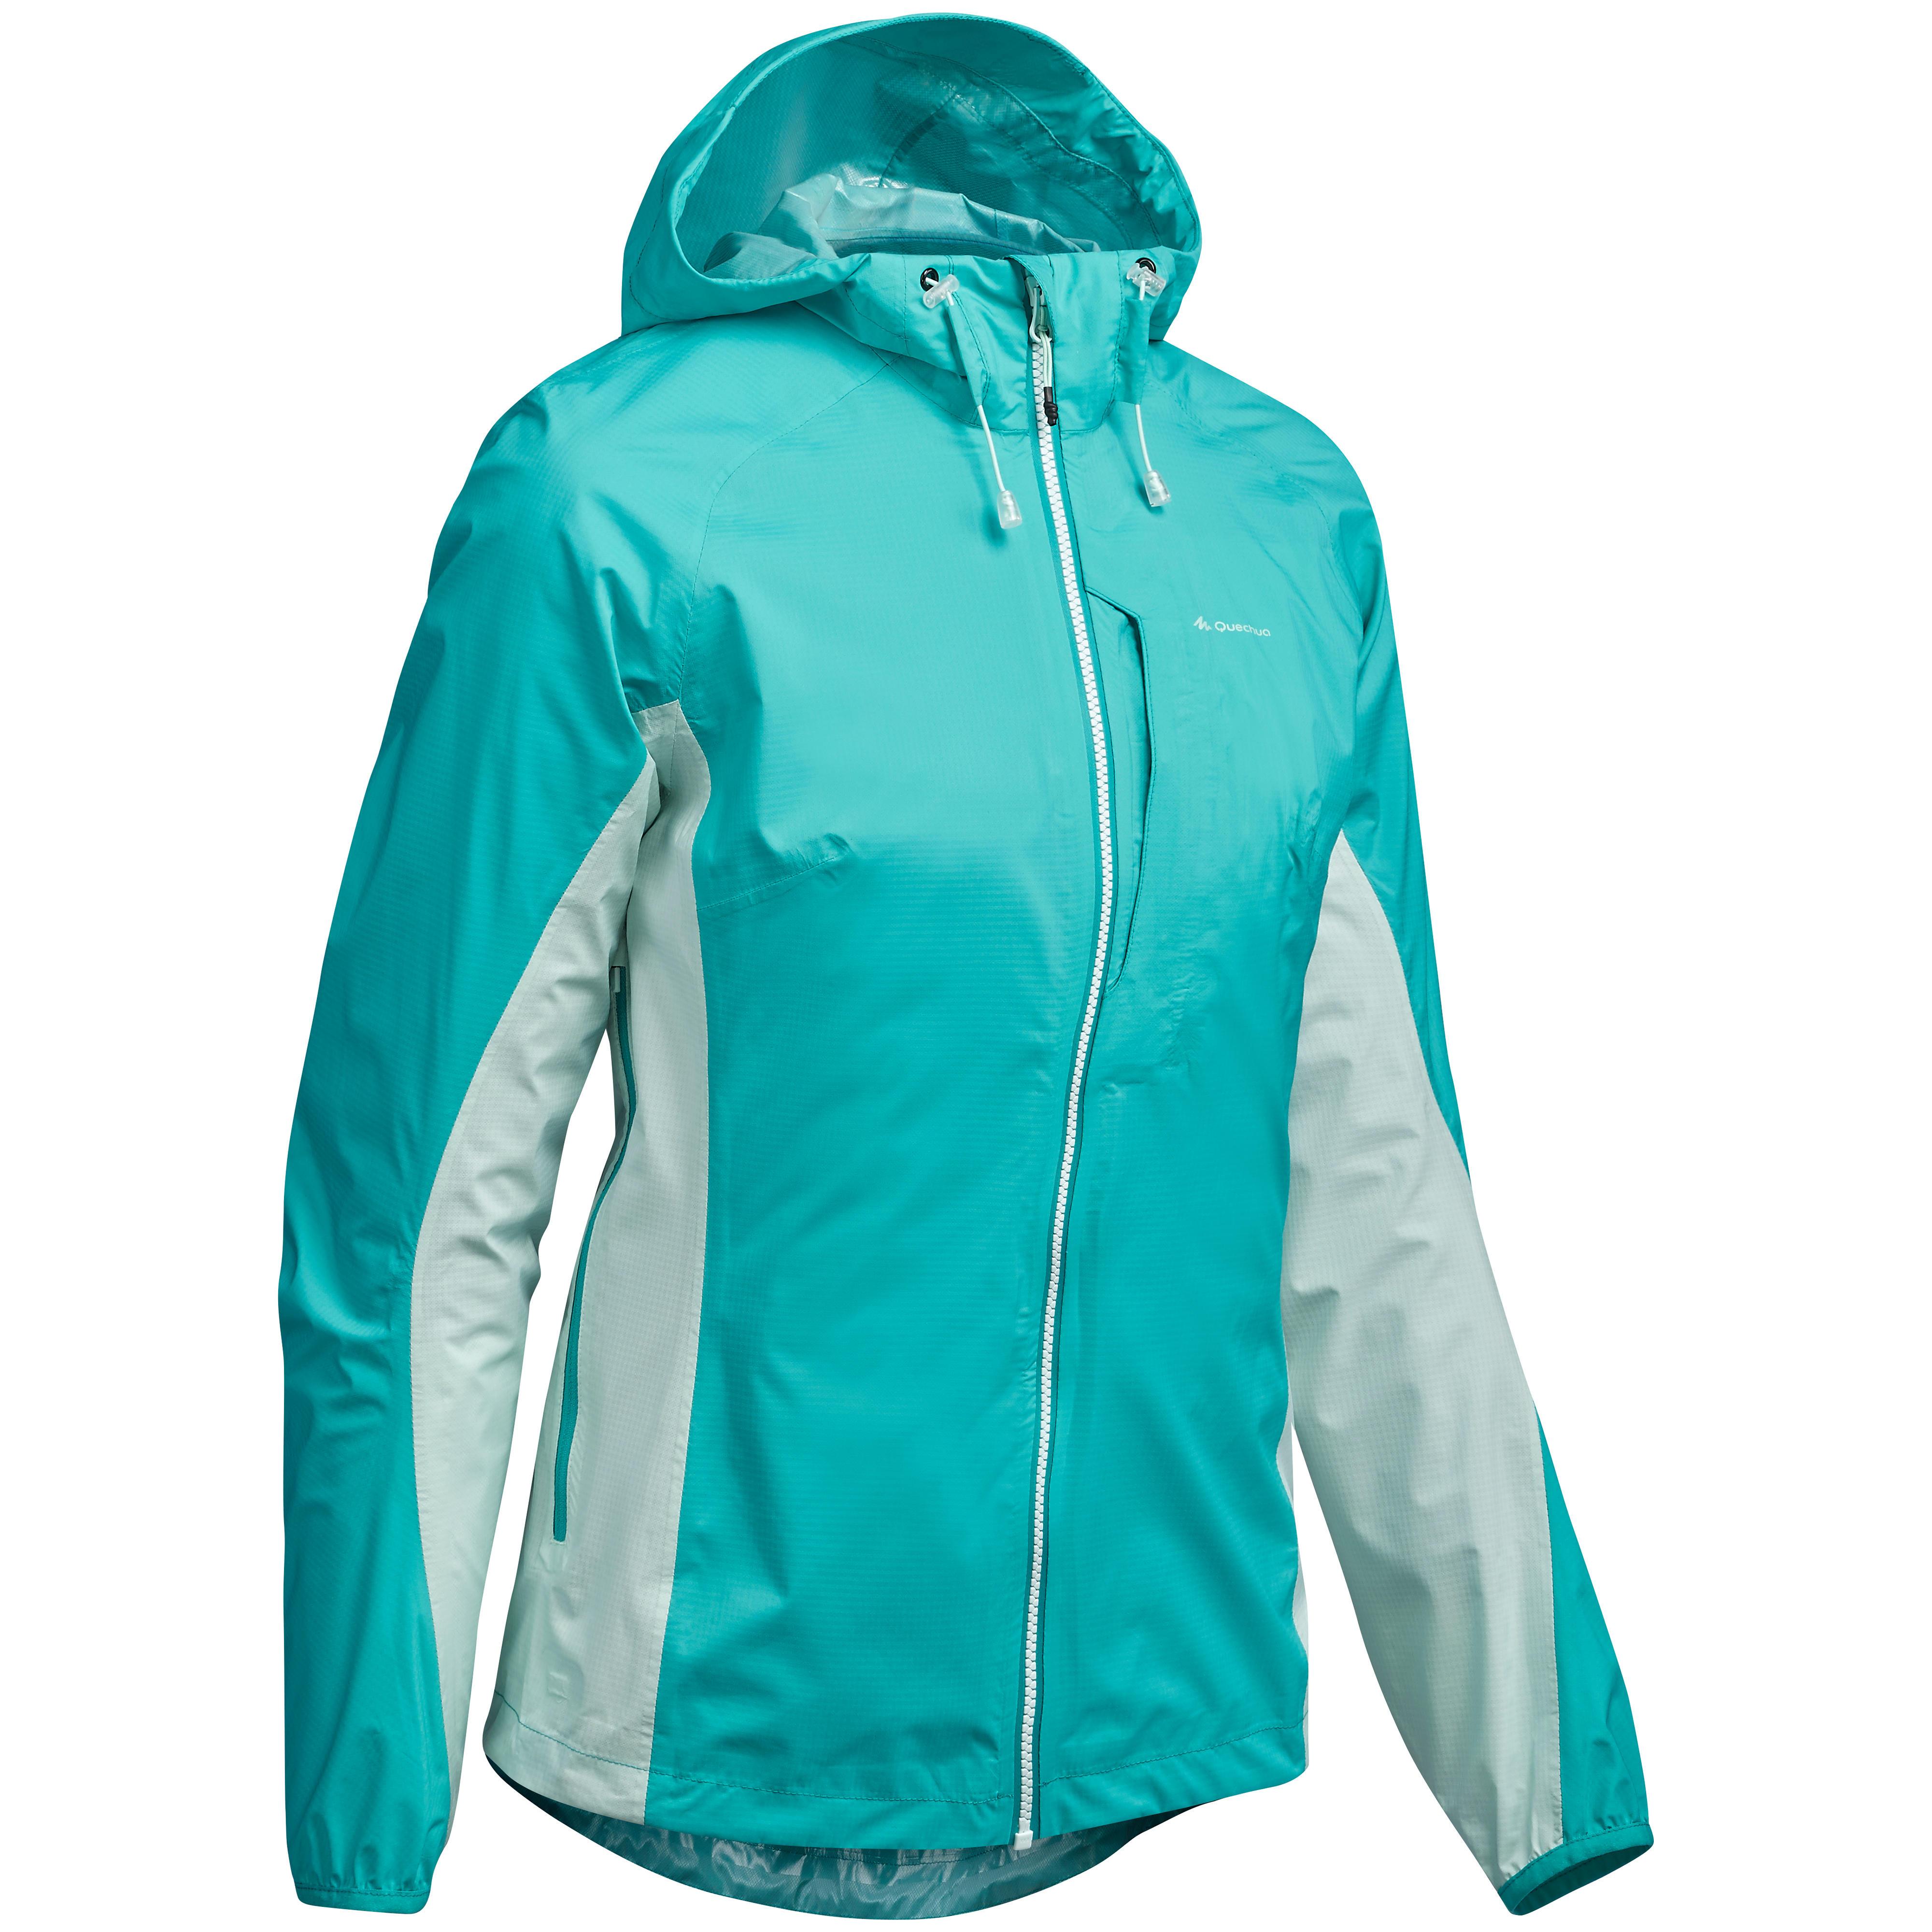 Jachetă Imper Helium Rain Damă